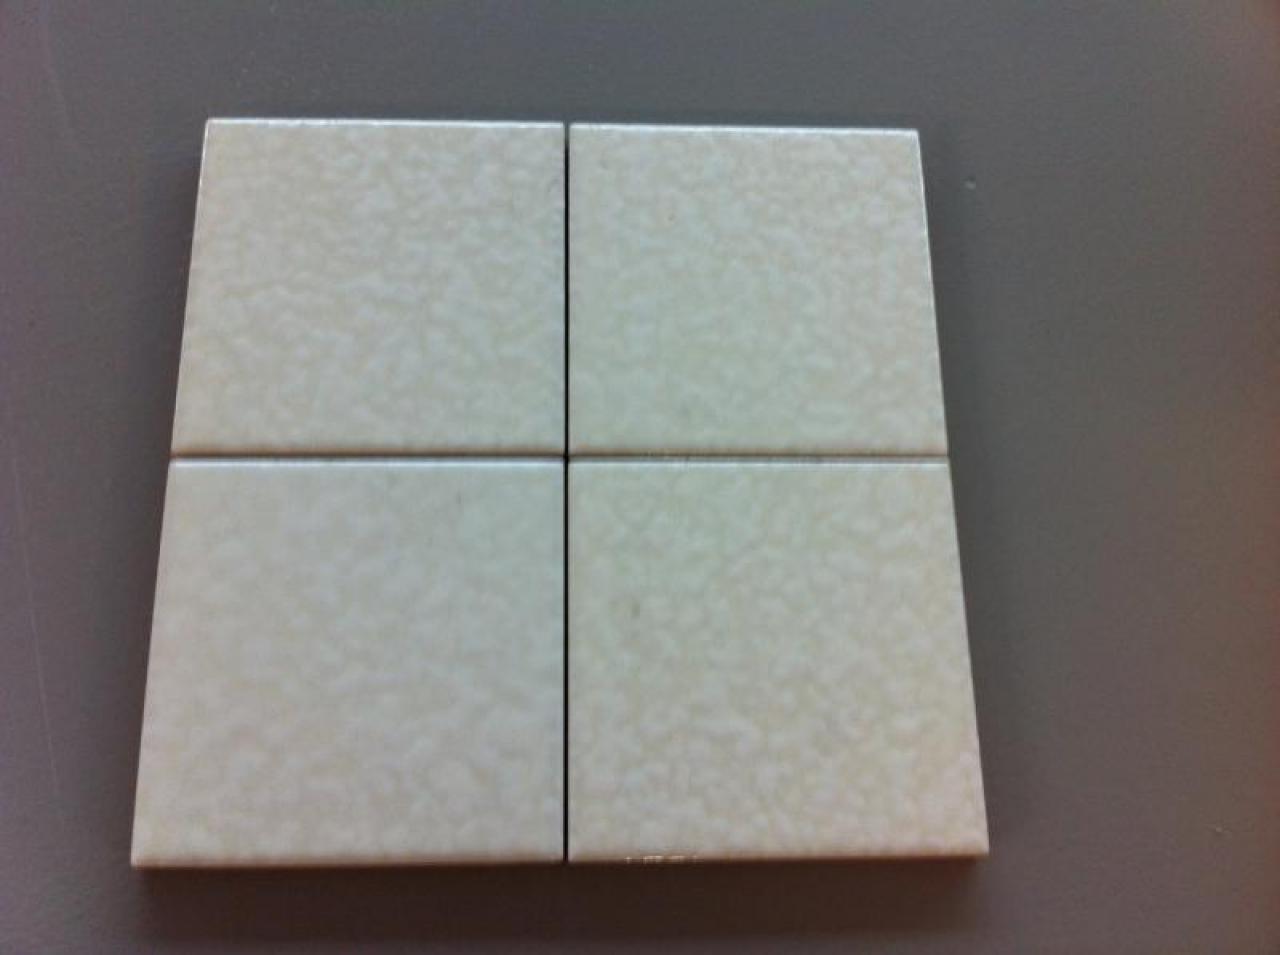 Rivestimento classico in ceramica bianca - outlet piastrelle Vicenza ...